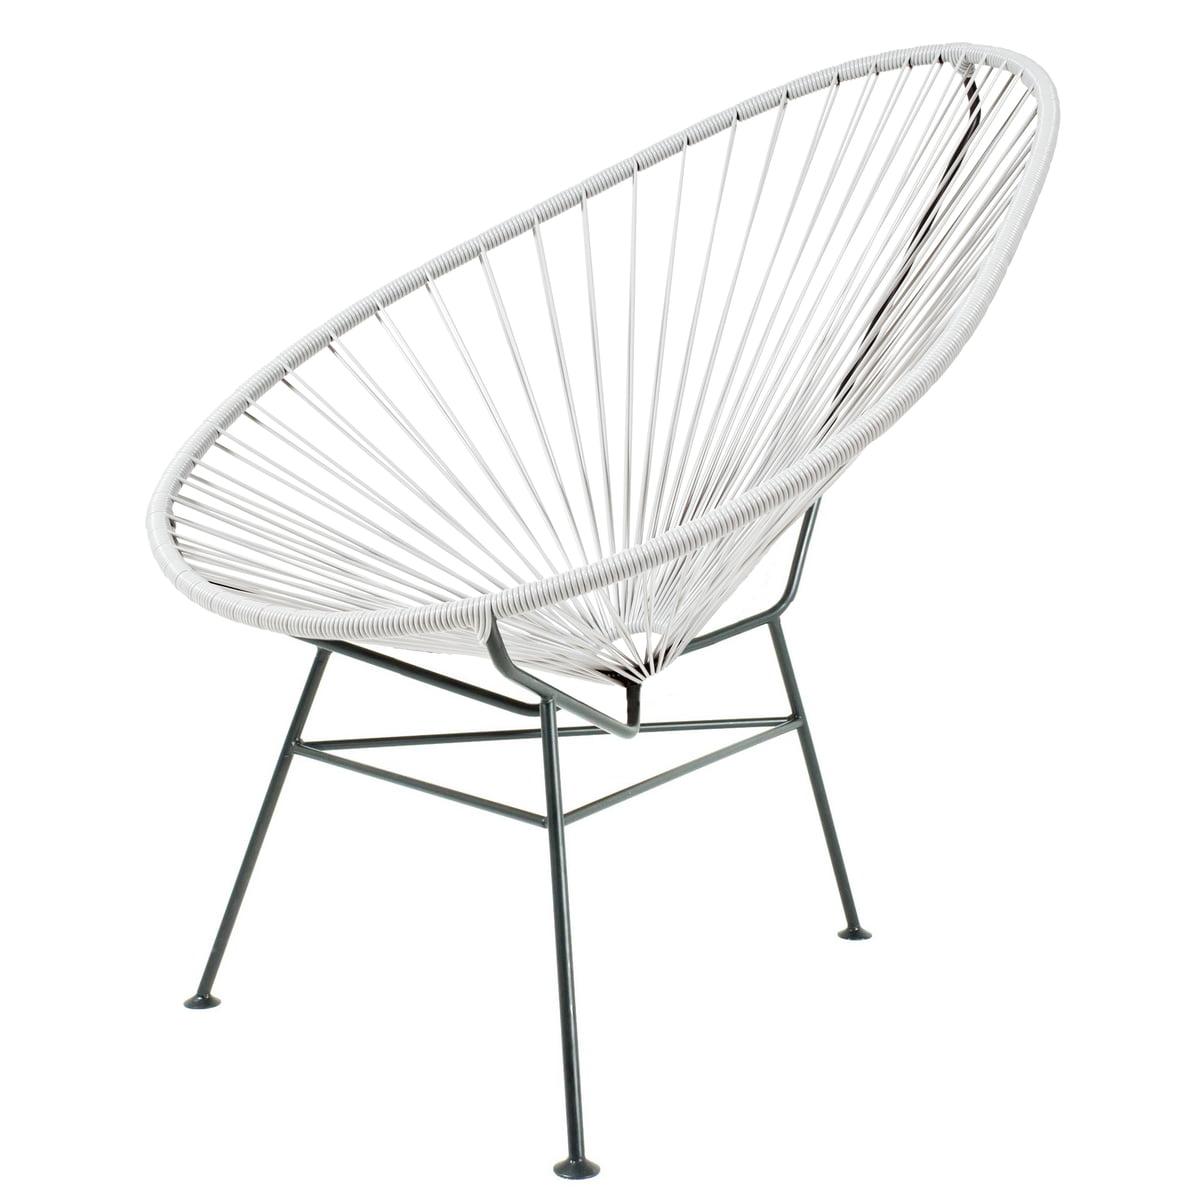 acapulco classic acapulco design connox. Black Bedroom Furniture Sets. Home Design Ideas